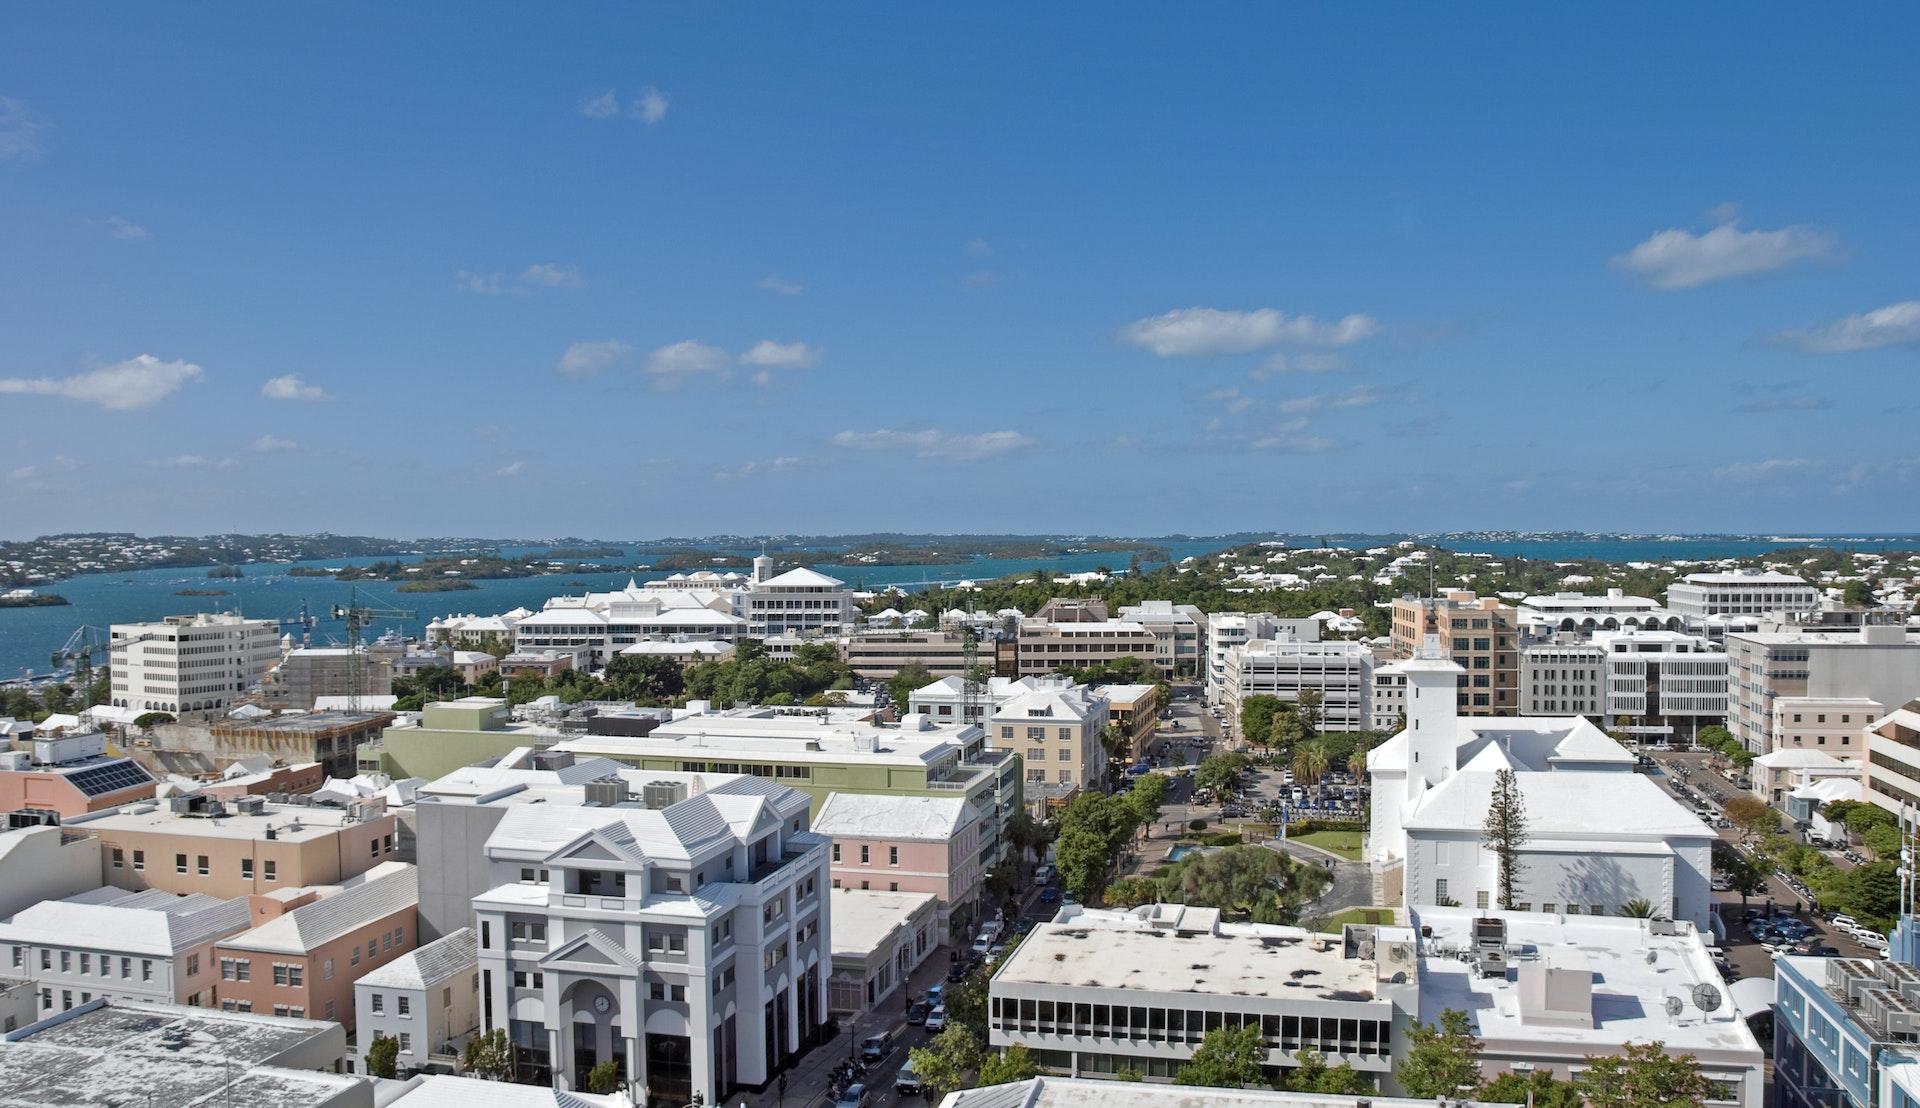 Hamilton, Bermuda © wwing, Getty Images